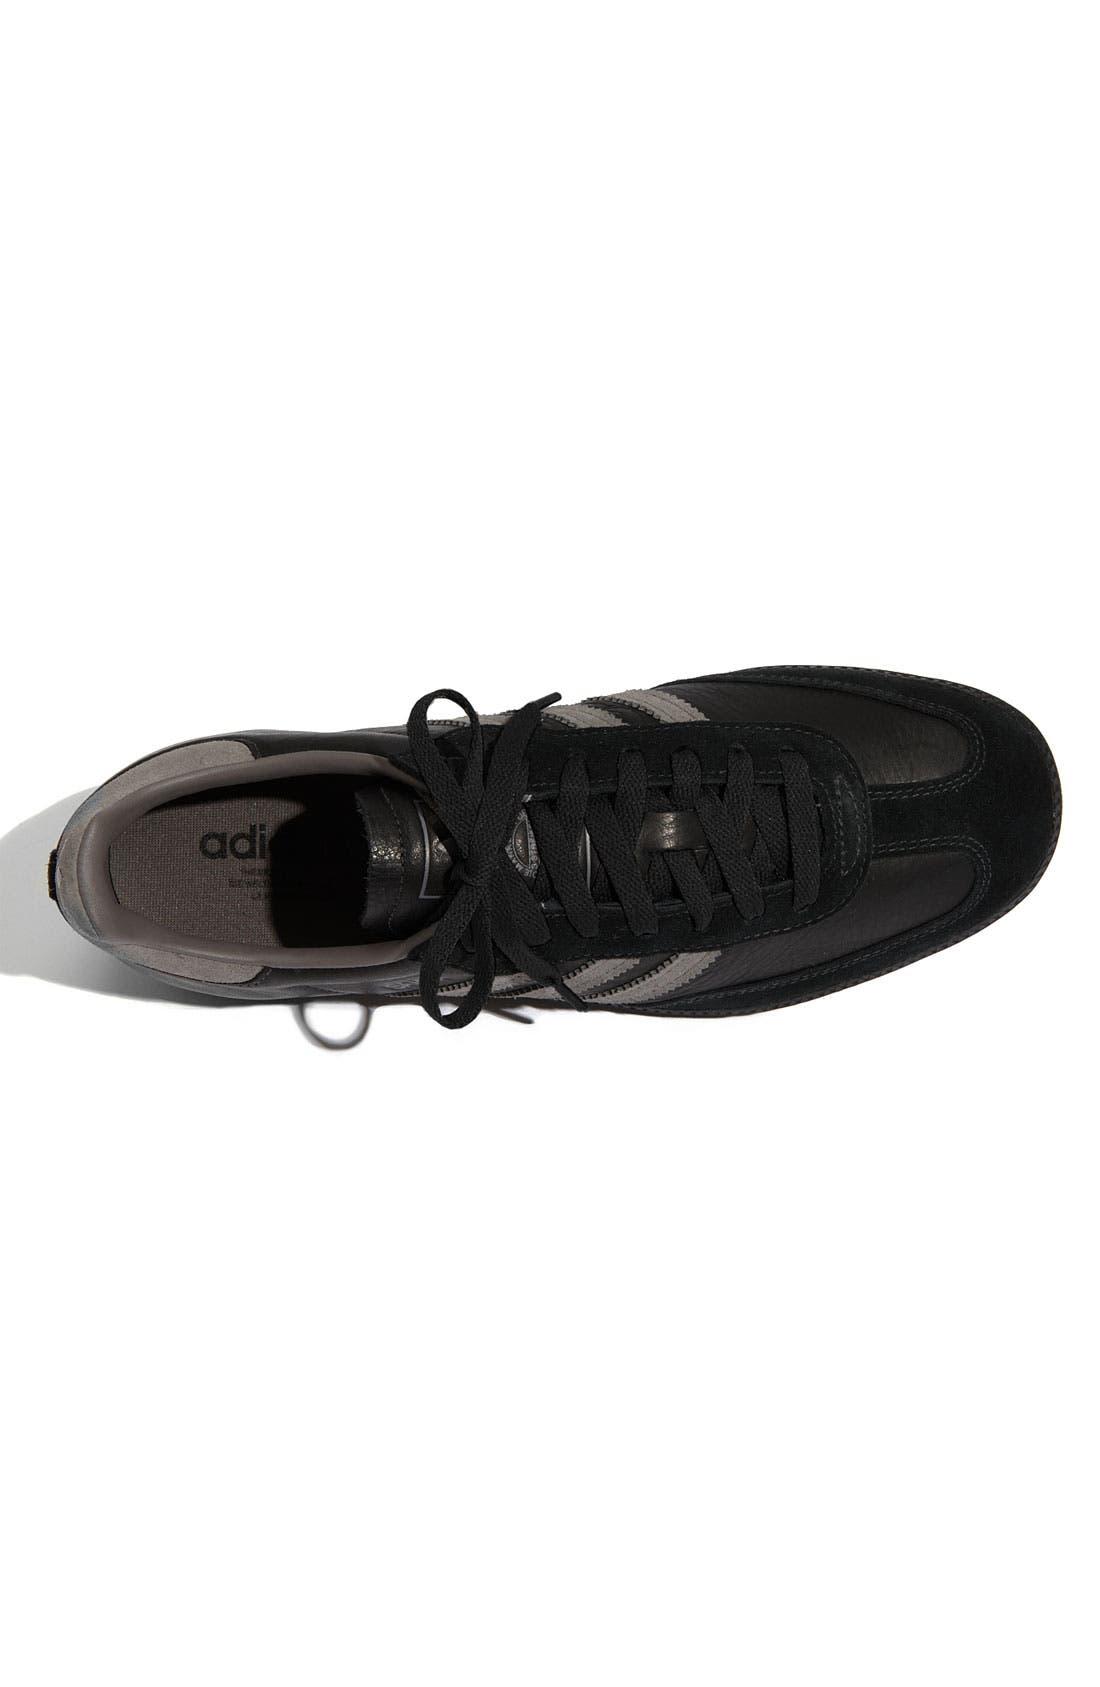 Alternate Image 2  - adidas 'Samba' Sneaker